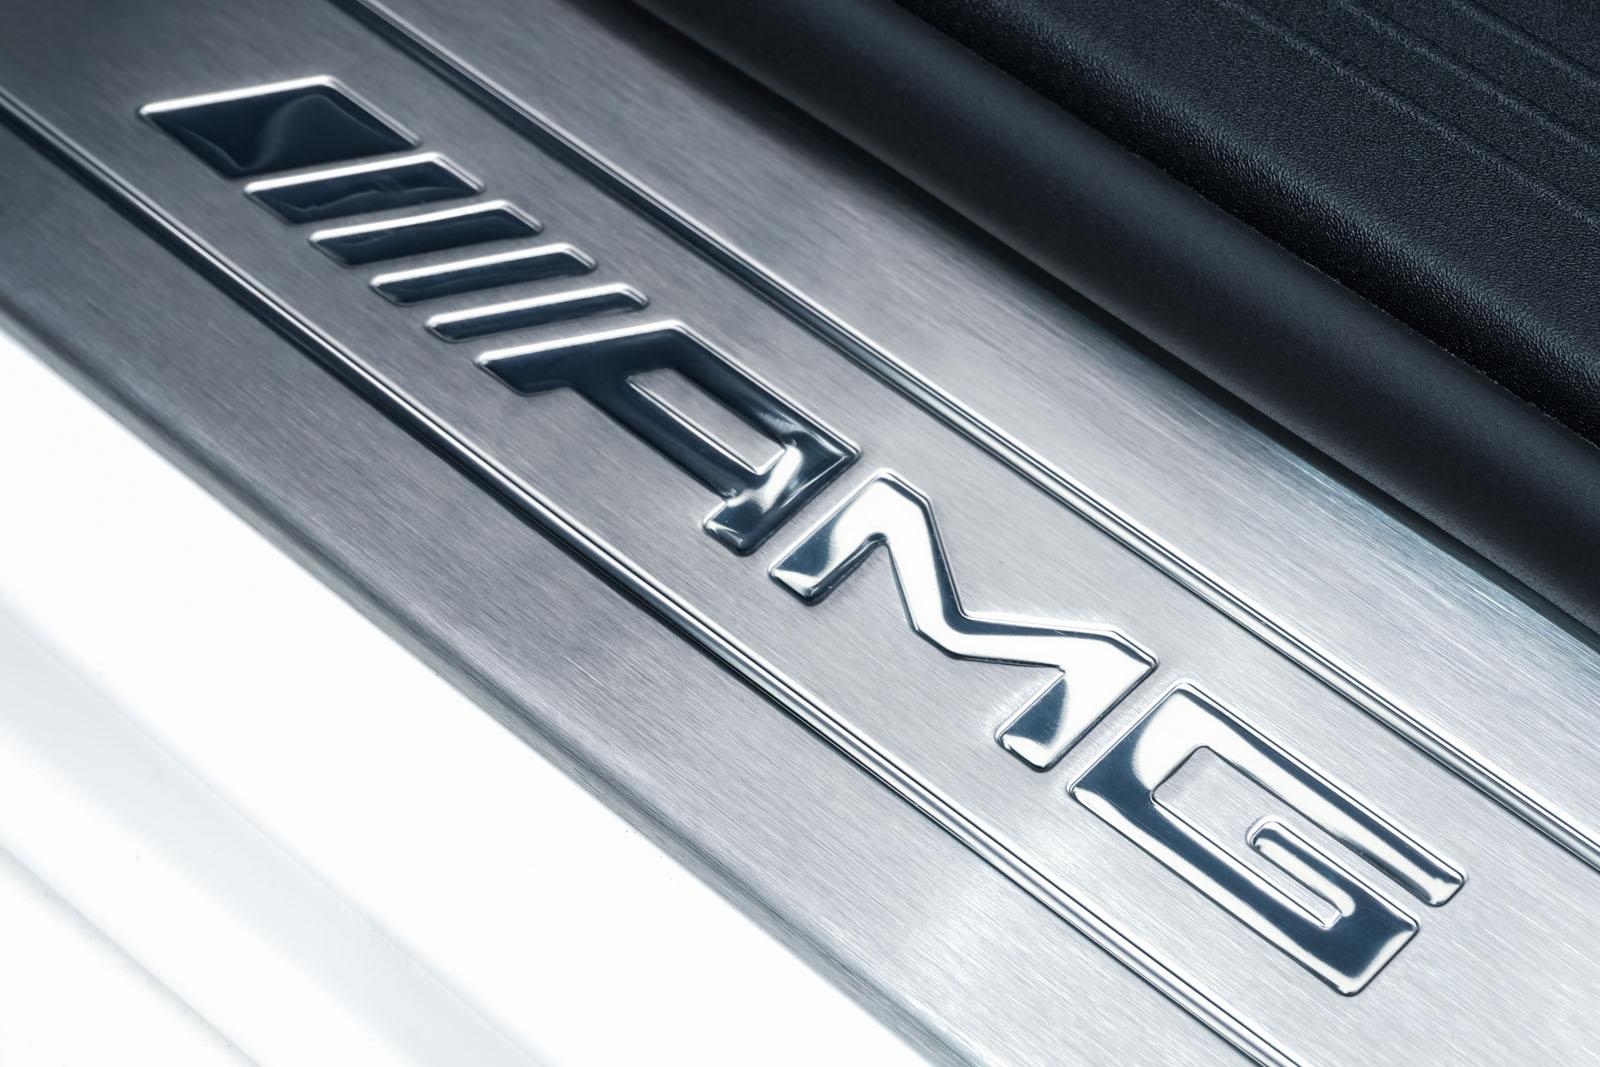 11Mercedes_Benz_AMG_GT_Roadster_Weiss_Schwarz_MB-9710_11_w